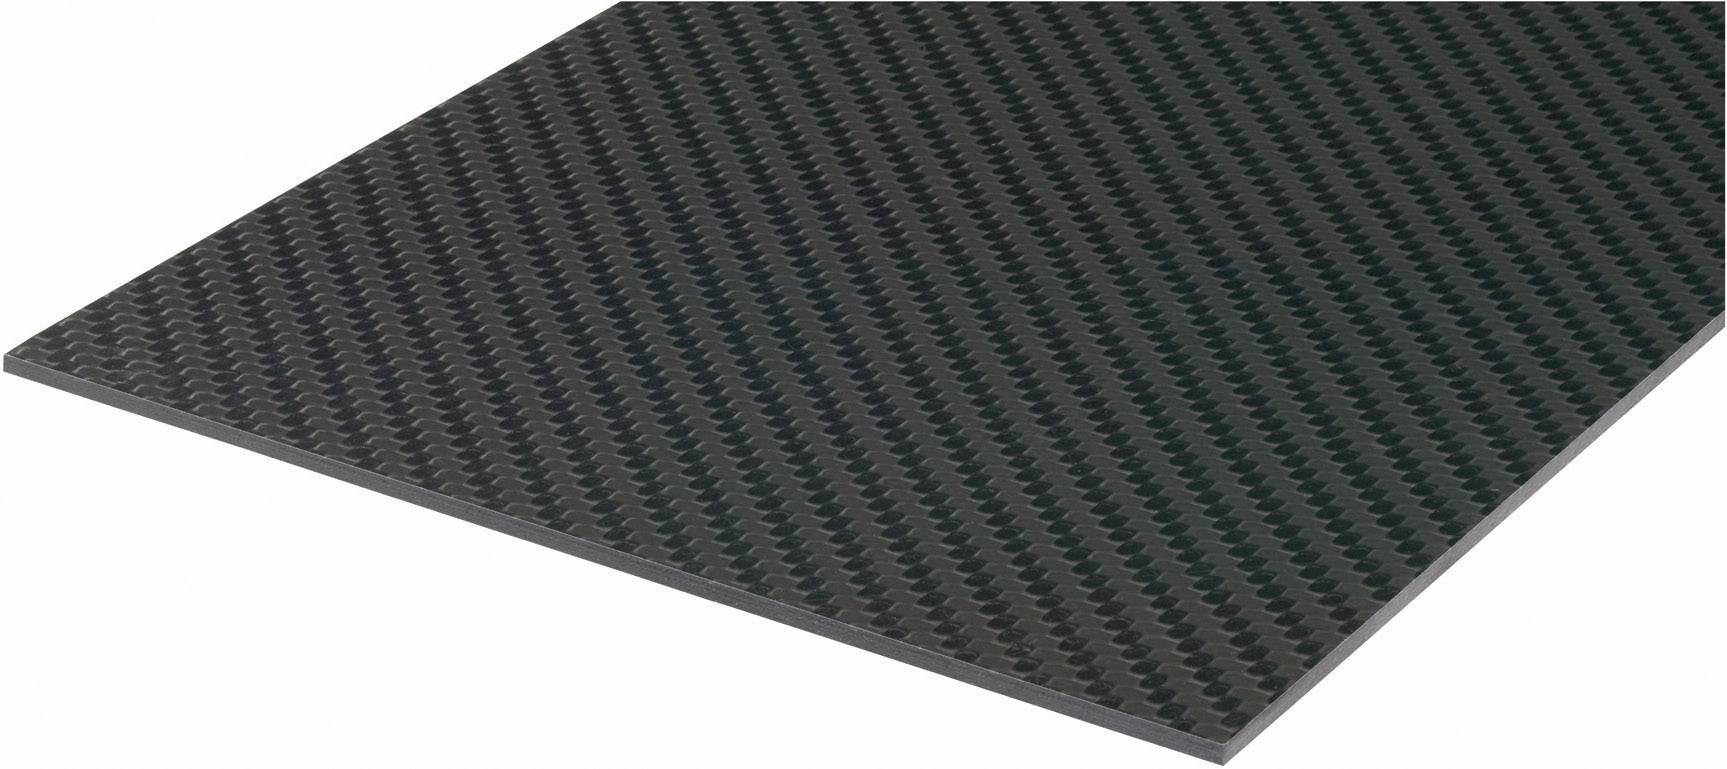 Uhlíková prepreg doska Carbotec 229917, (d x š) 340 mm x 150 mm x 2 mm